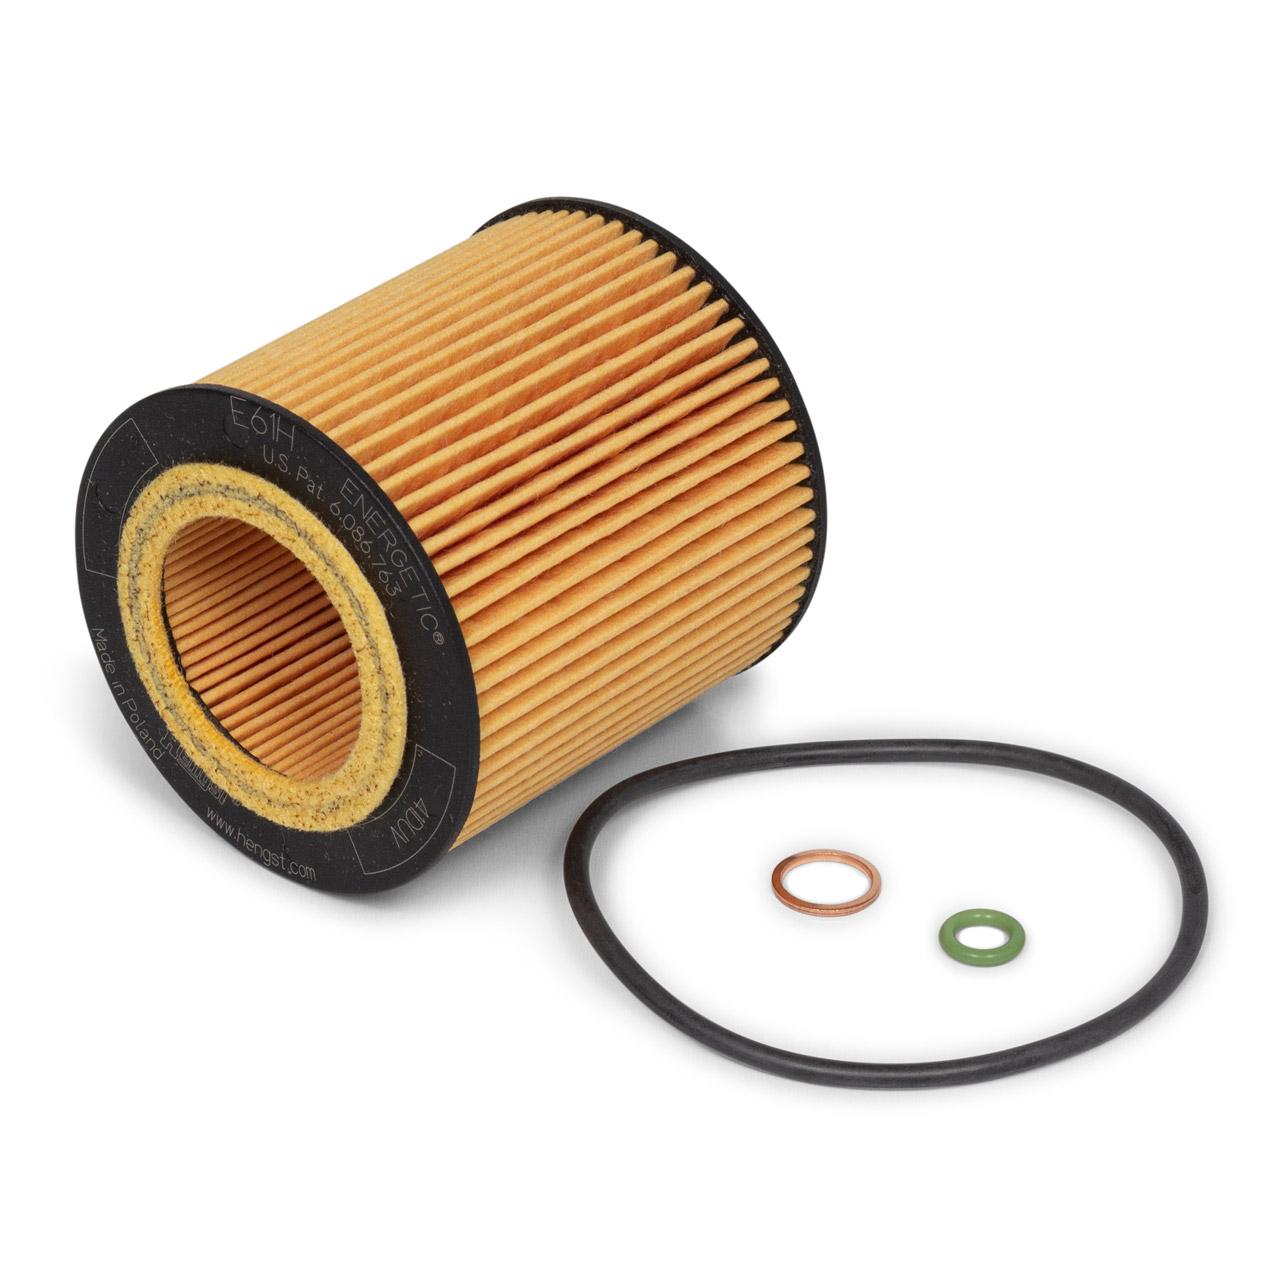 Inspektionskit Filterpaket für BMW X5 E70 X6 E71 E72 xDrive35i 306 / 320 PS